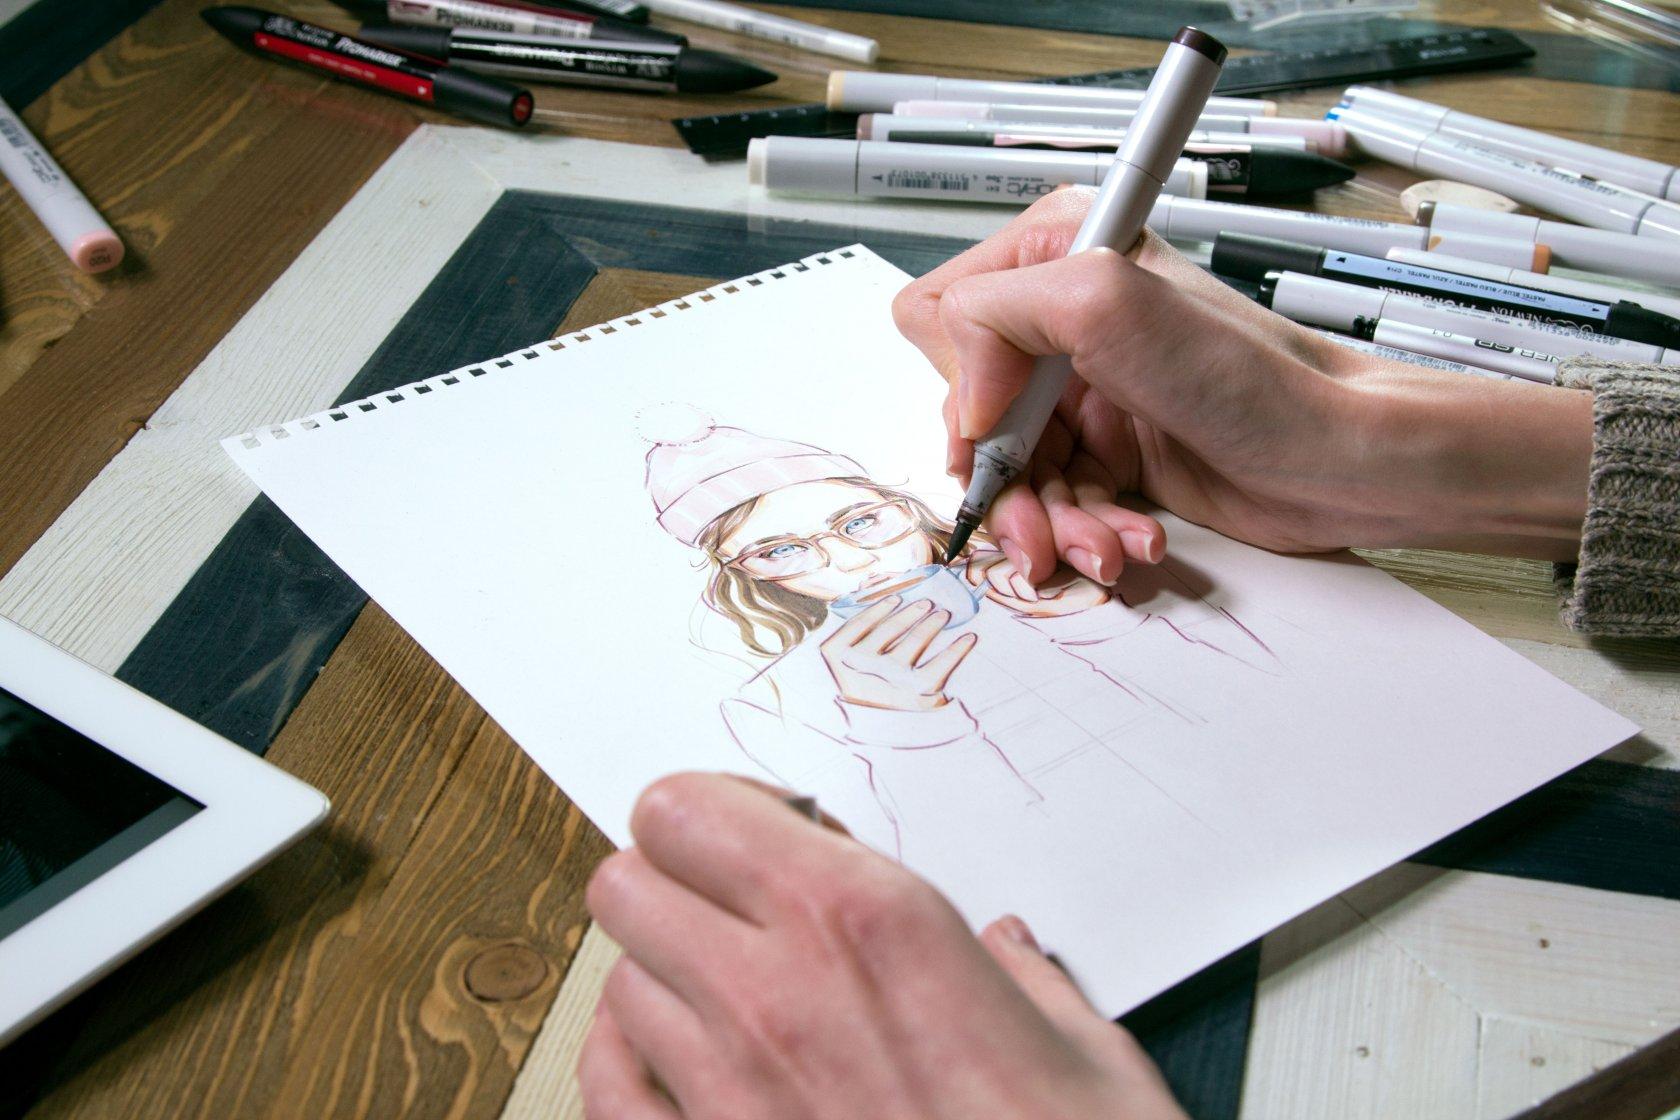 Скетчинг: как нарисовать сайт на бумаге —статьи на skillbox